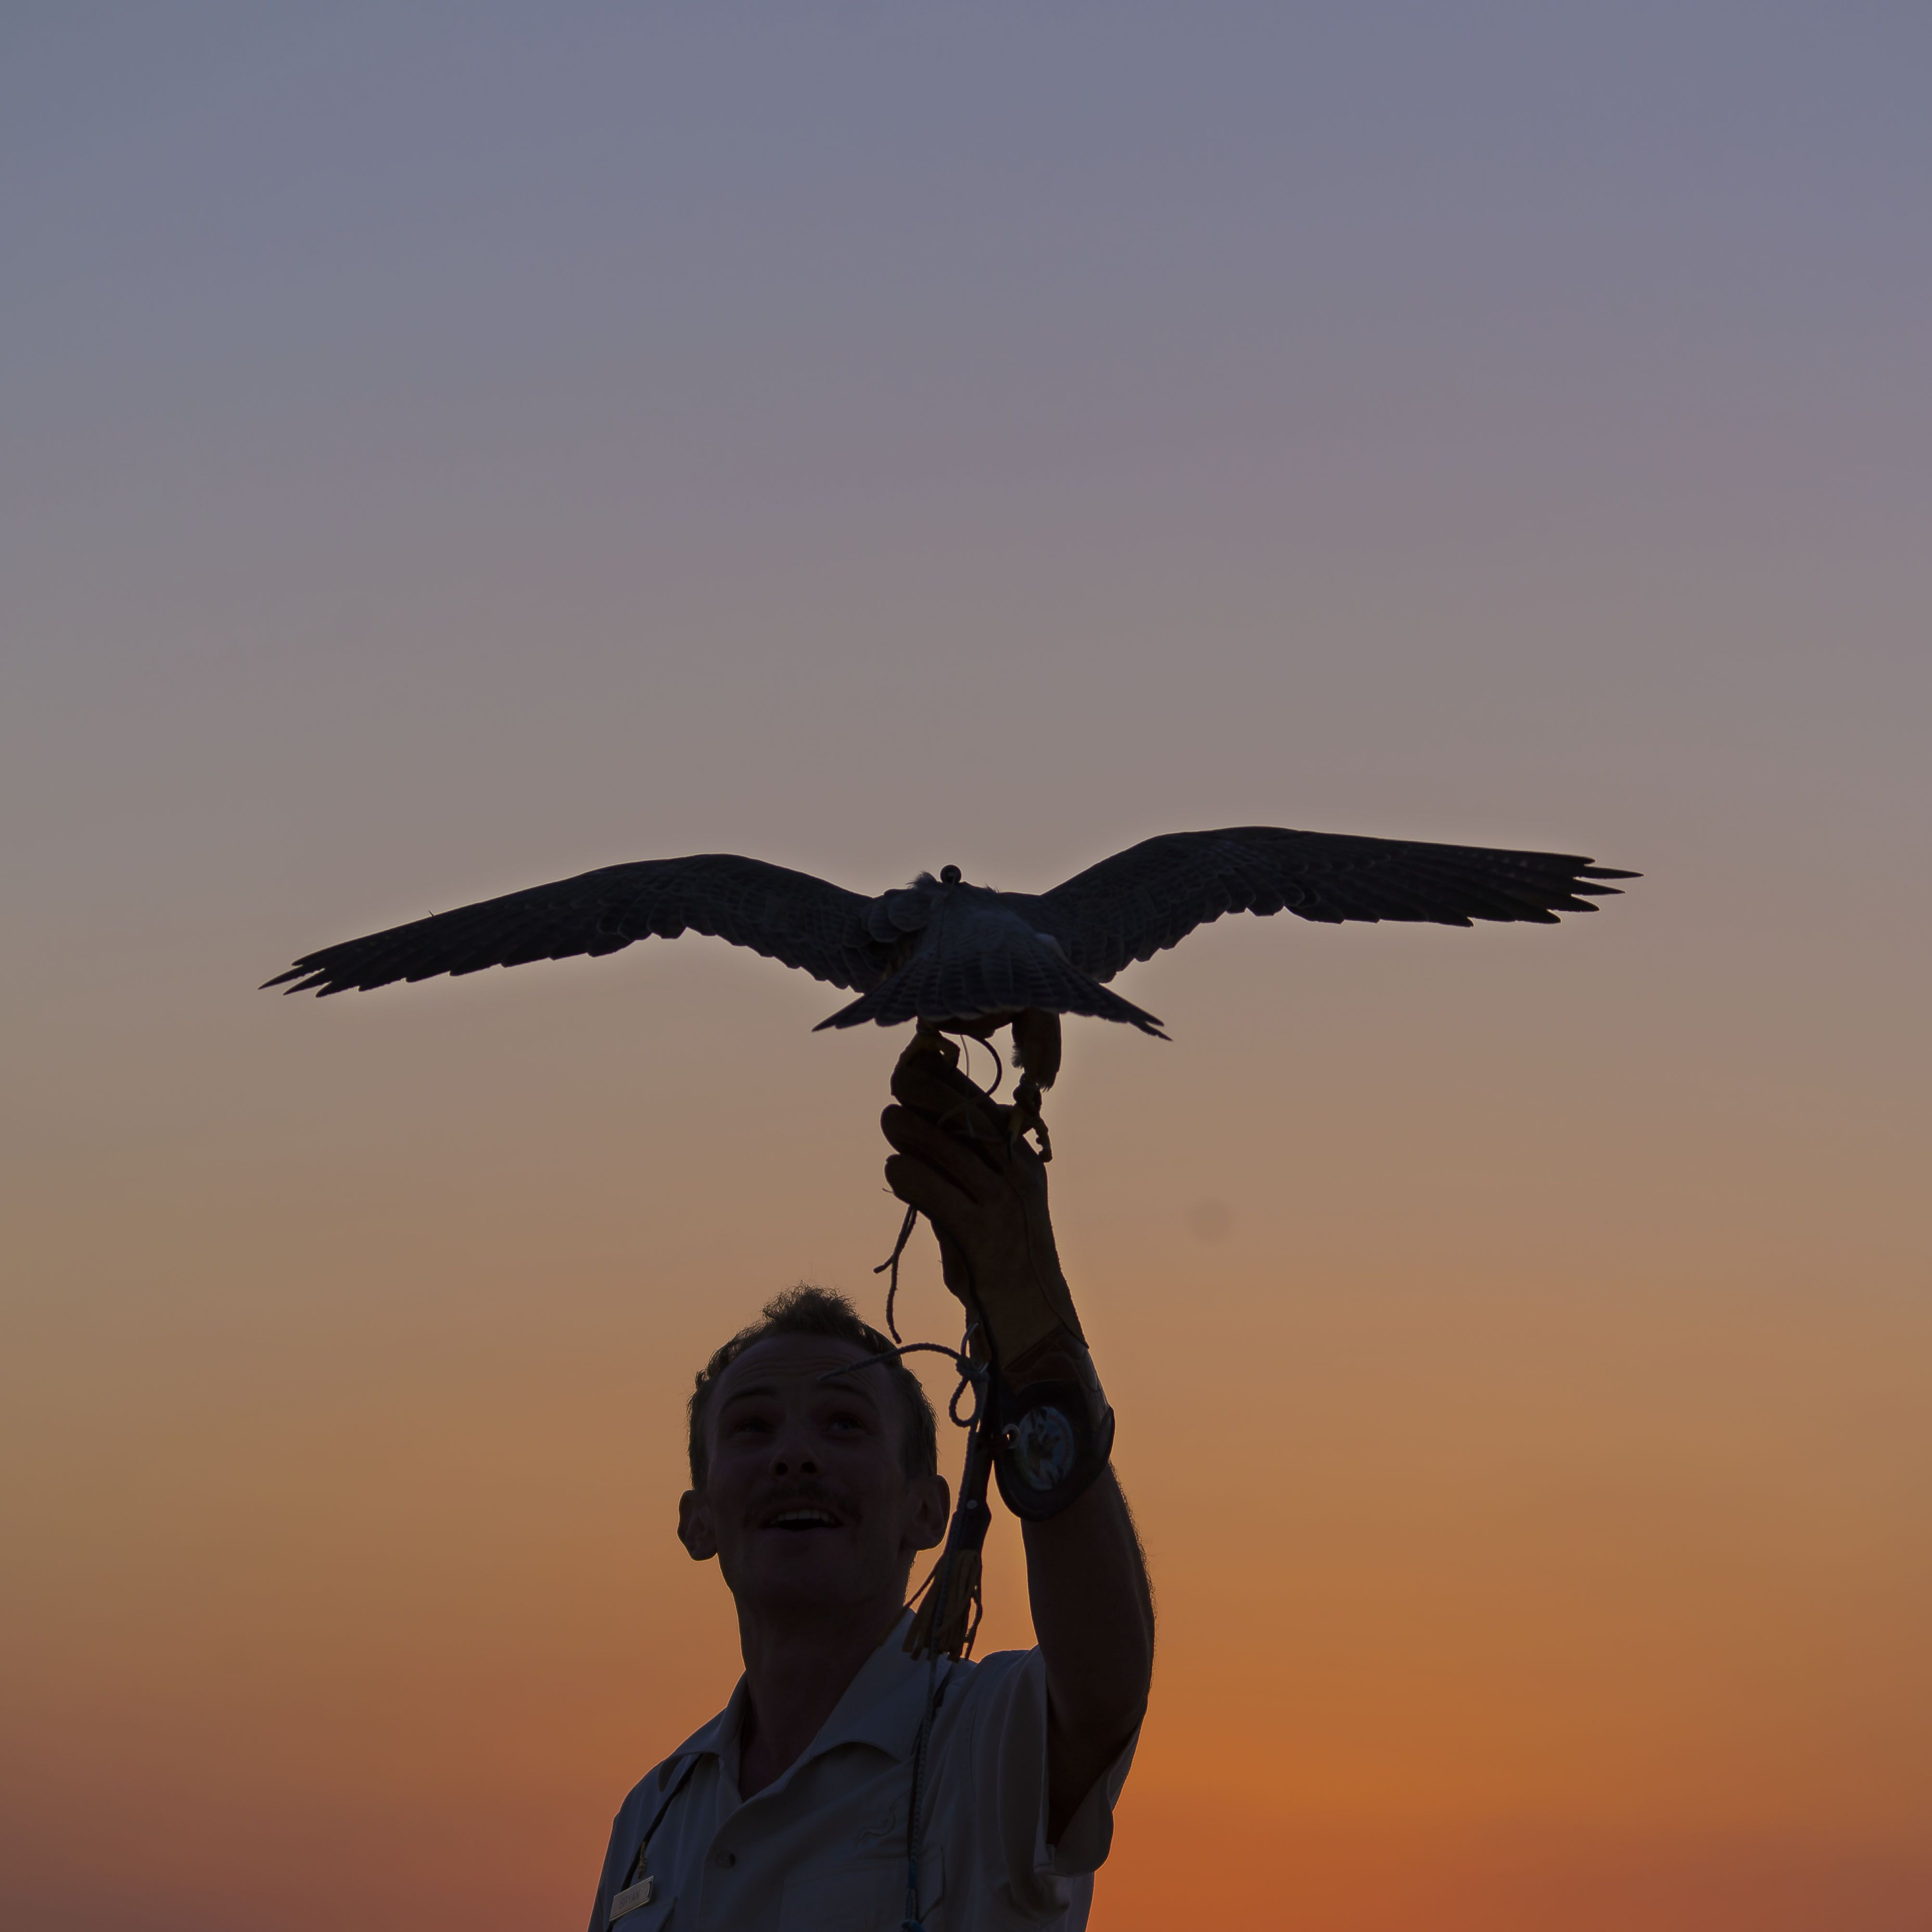 Take To Arab Tradition At Al Hurr Falconry Services In Nad Al Sheba 사진 한국